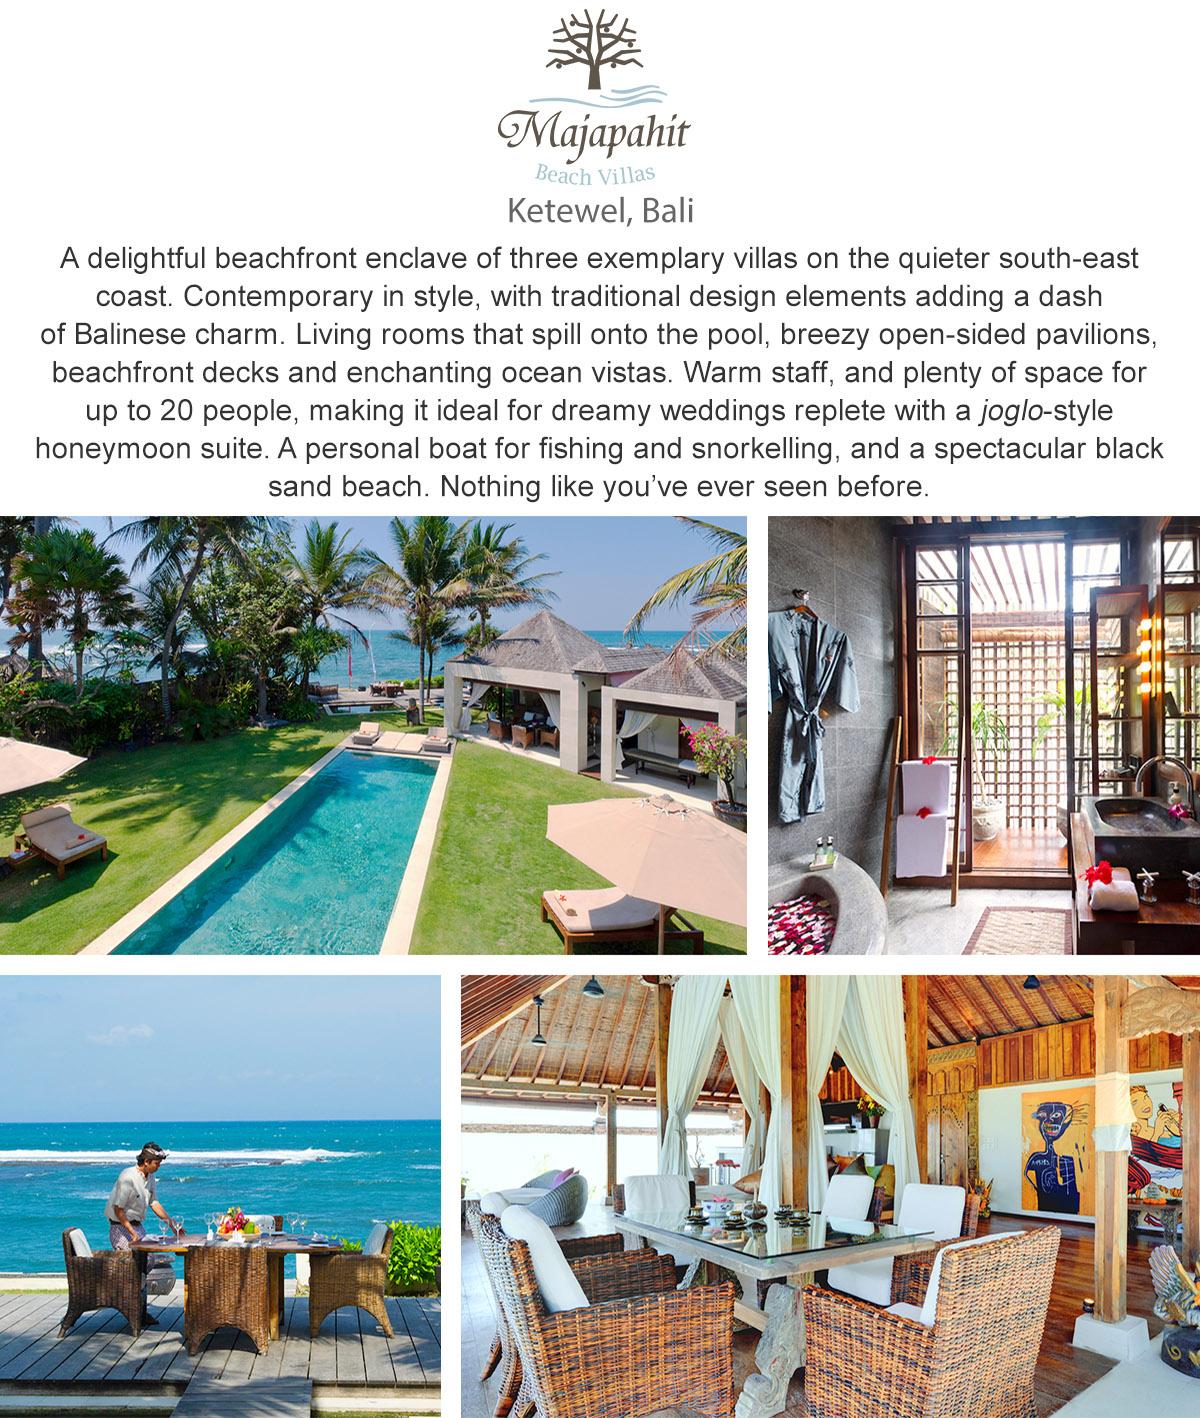 Majapahit Beach Villas - Ketewel, Bali